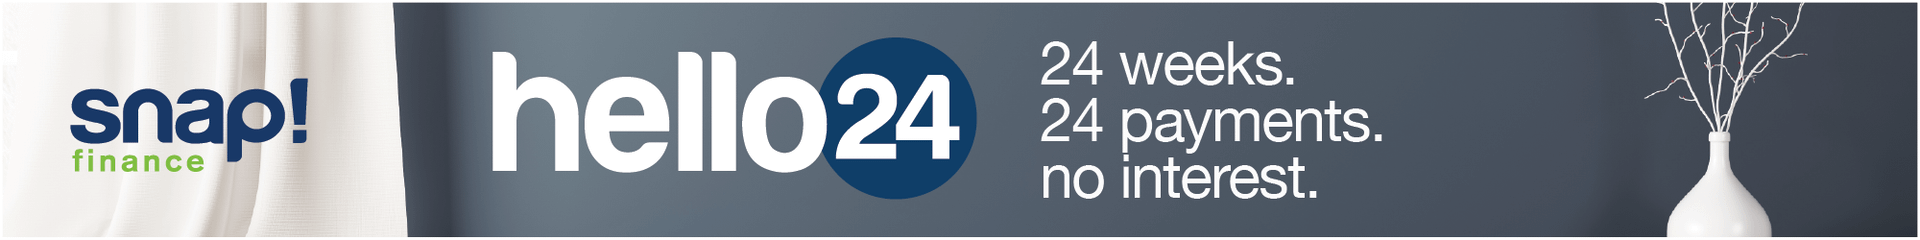 h24banner